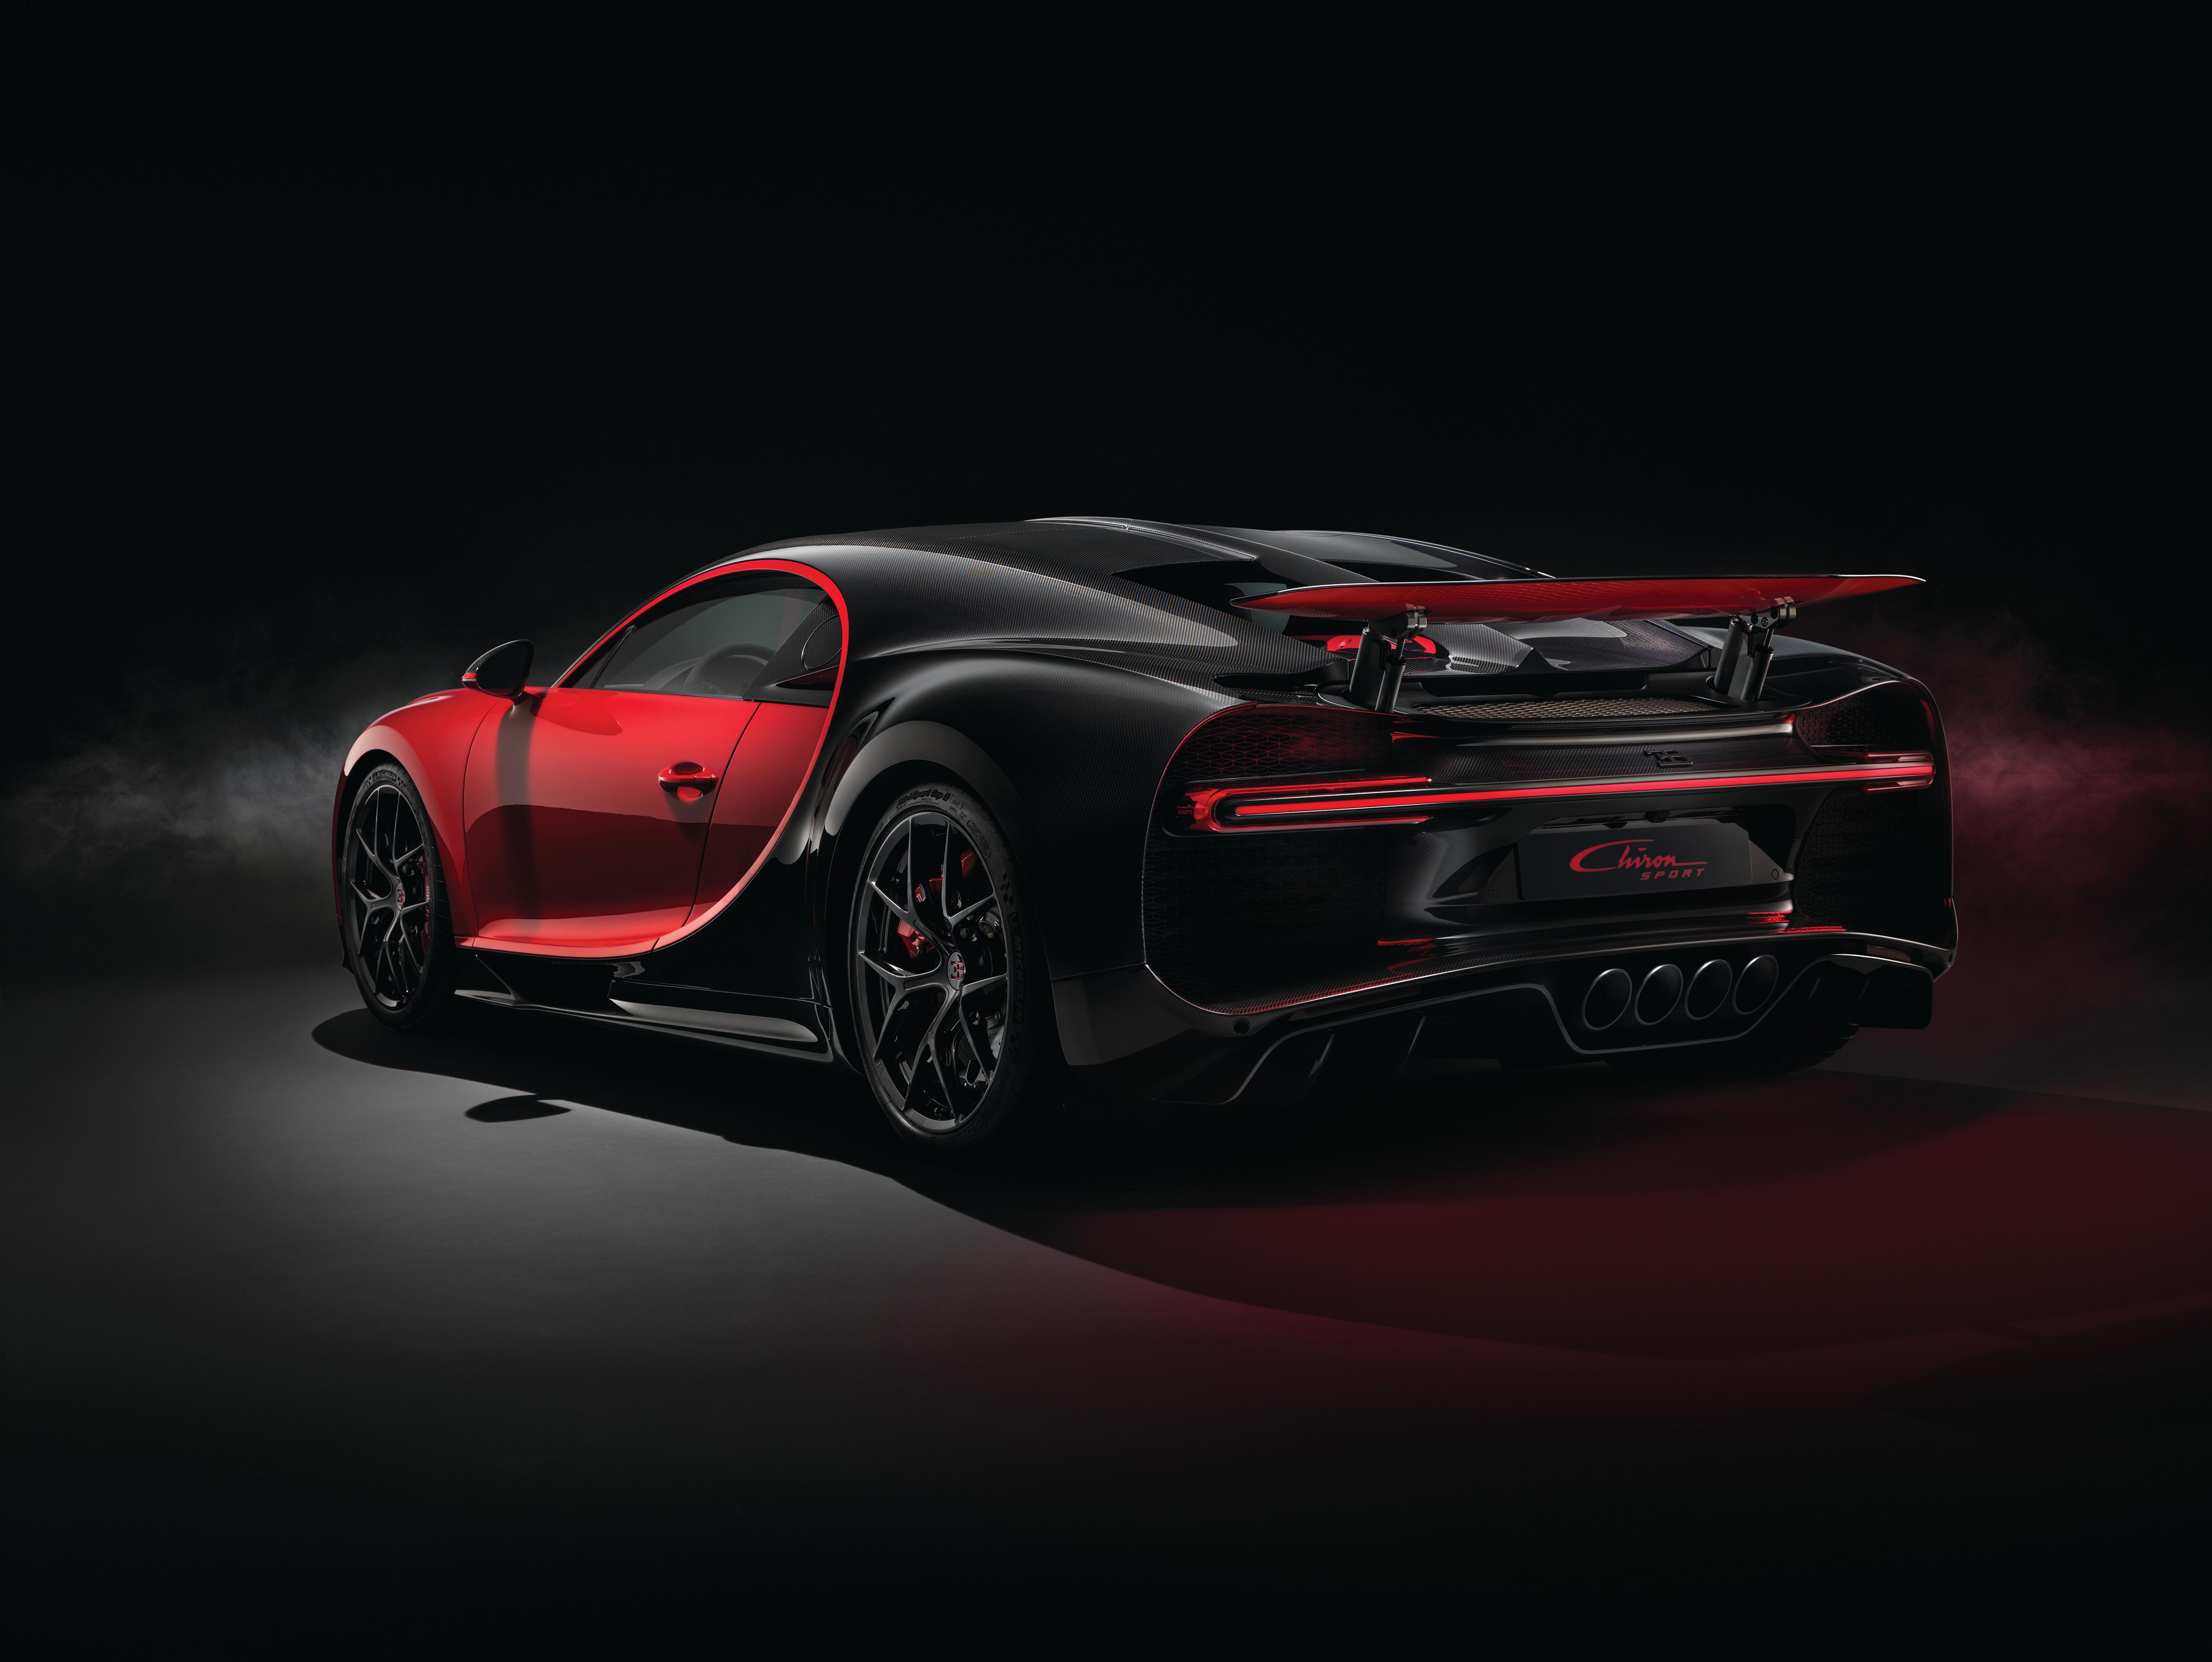 2018 Red Bugatti Chiron Sport Rear View, HD Cars, 4k ...